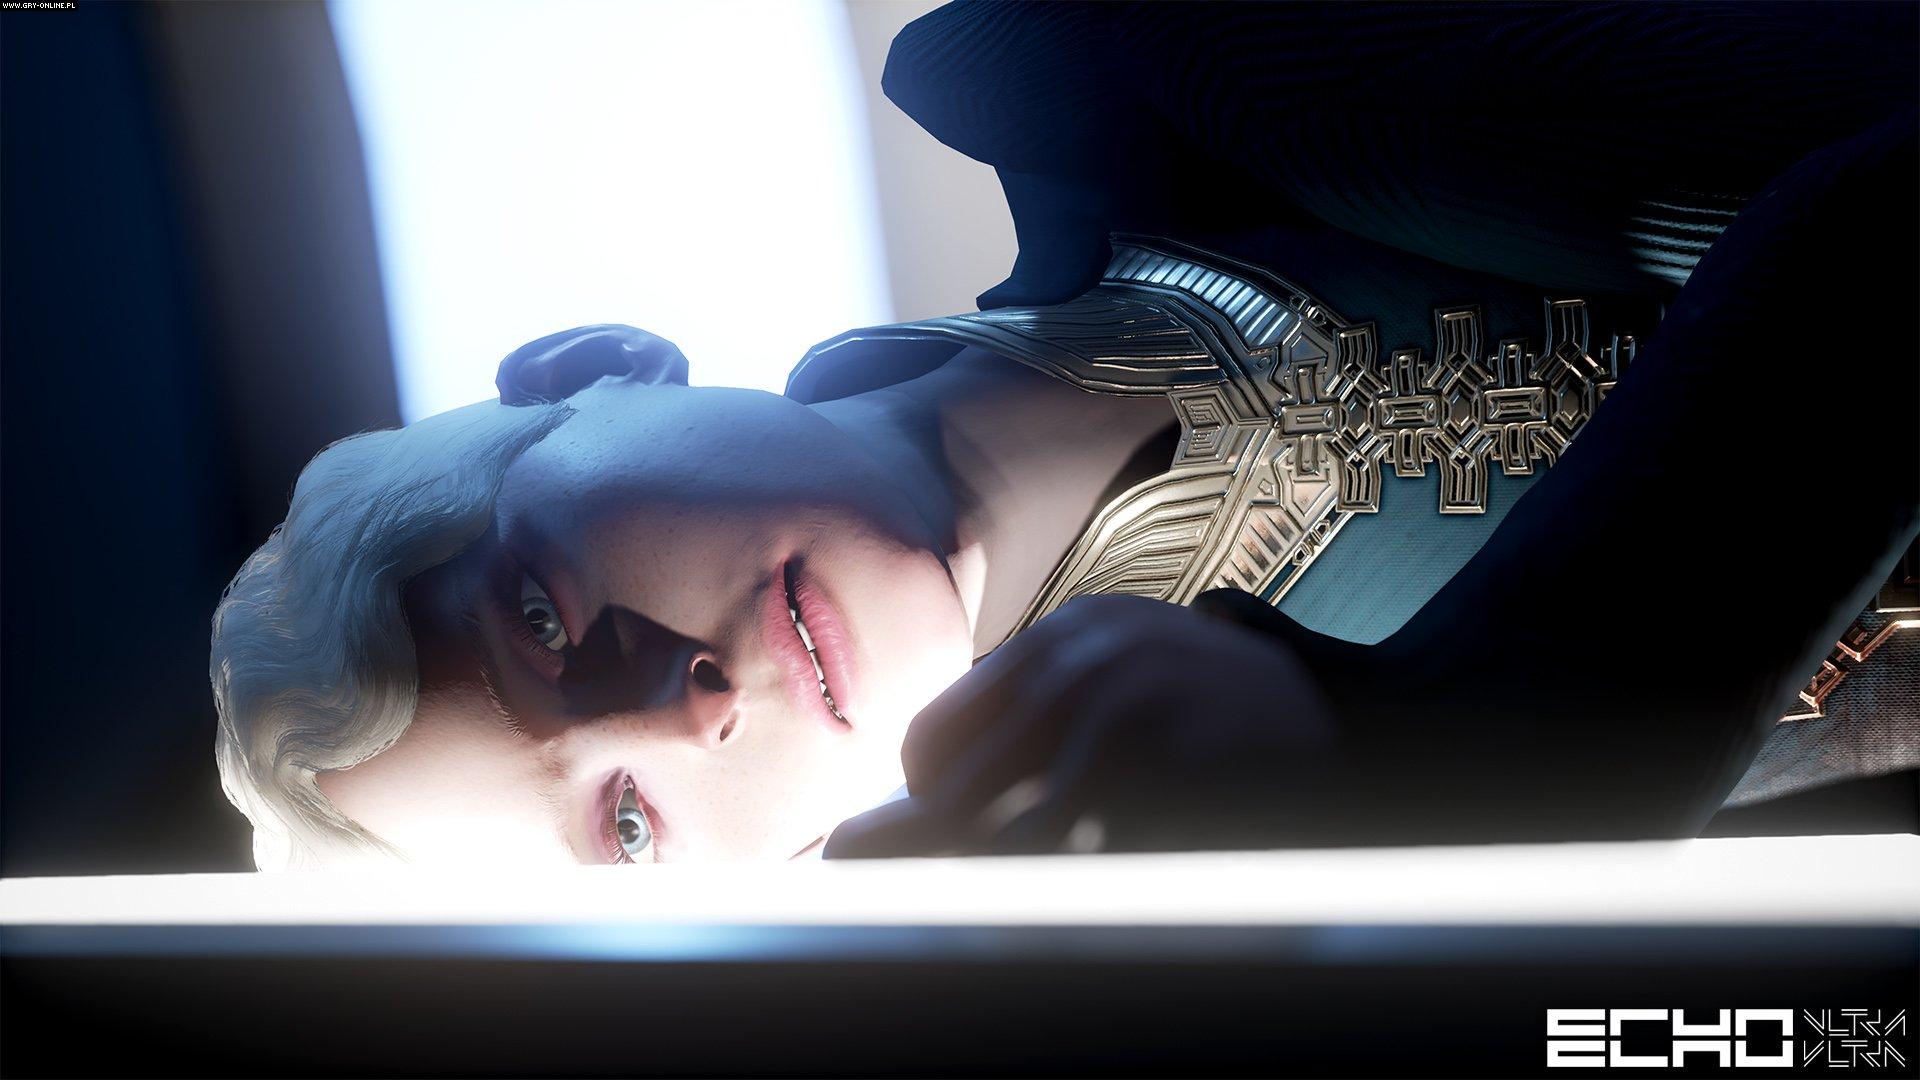 ECHO PC Games Image 7/7, Ultra Ultra